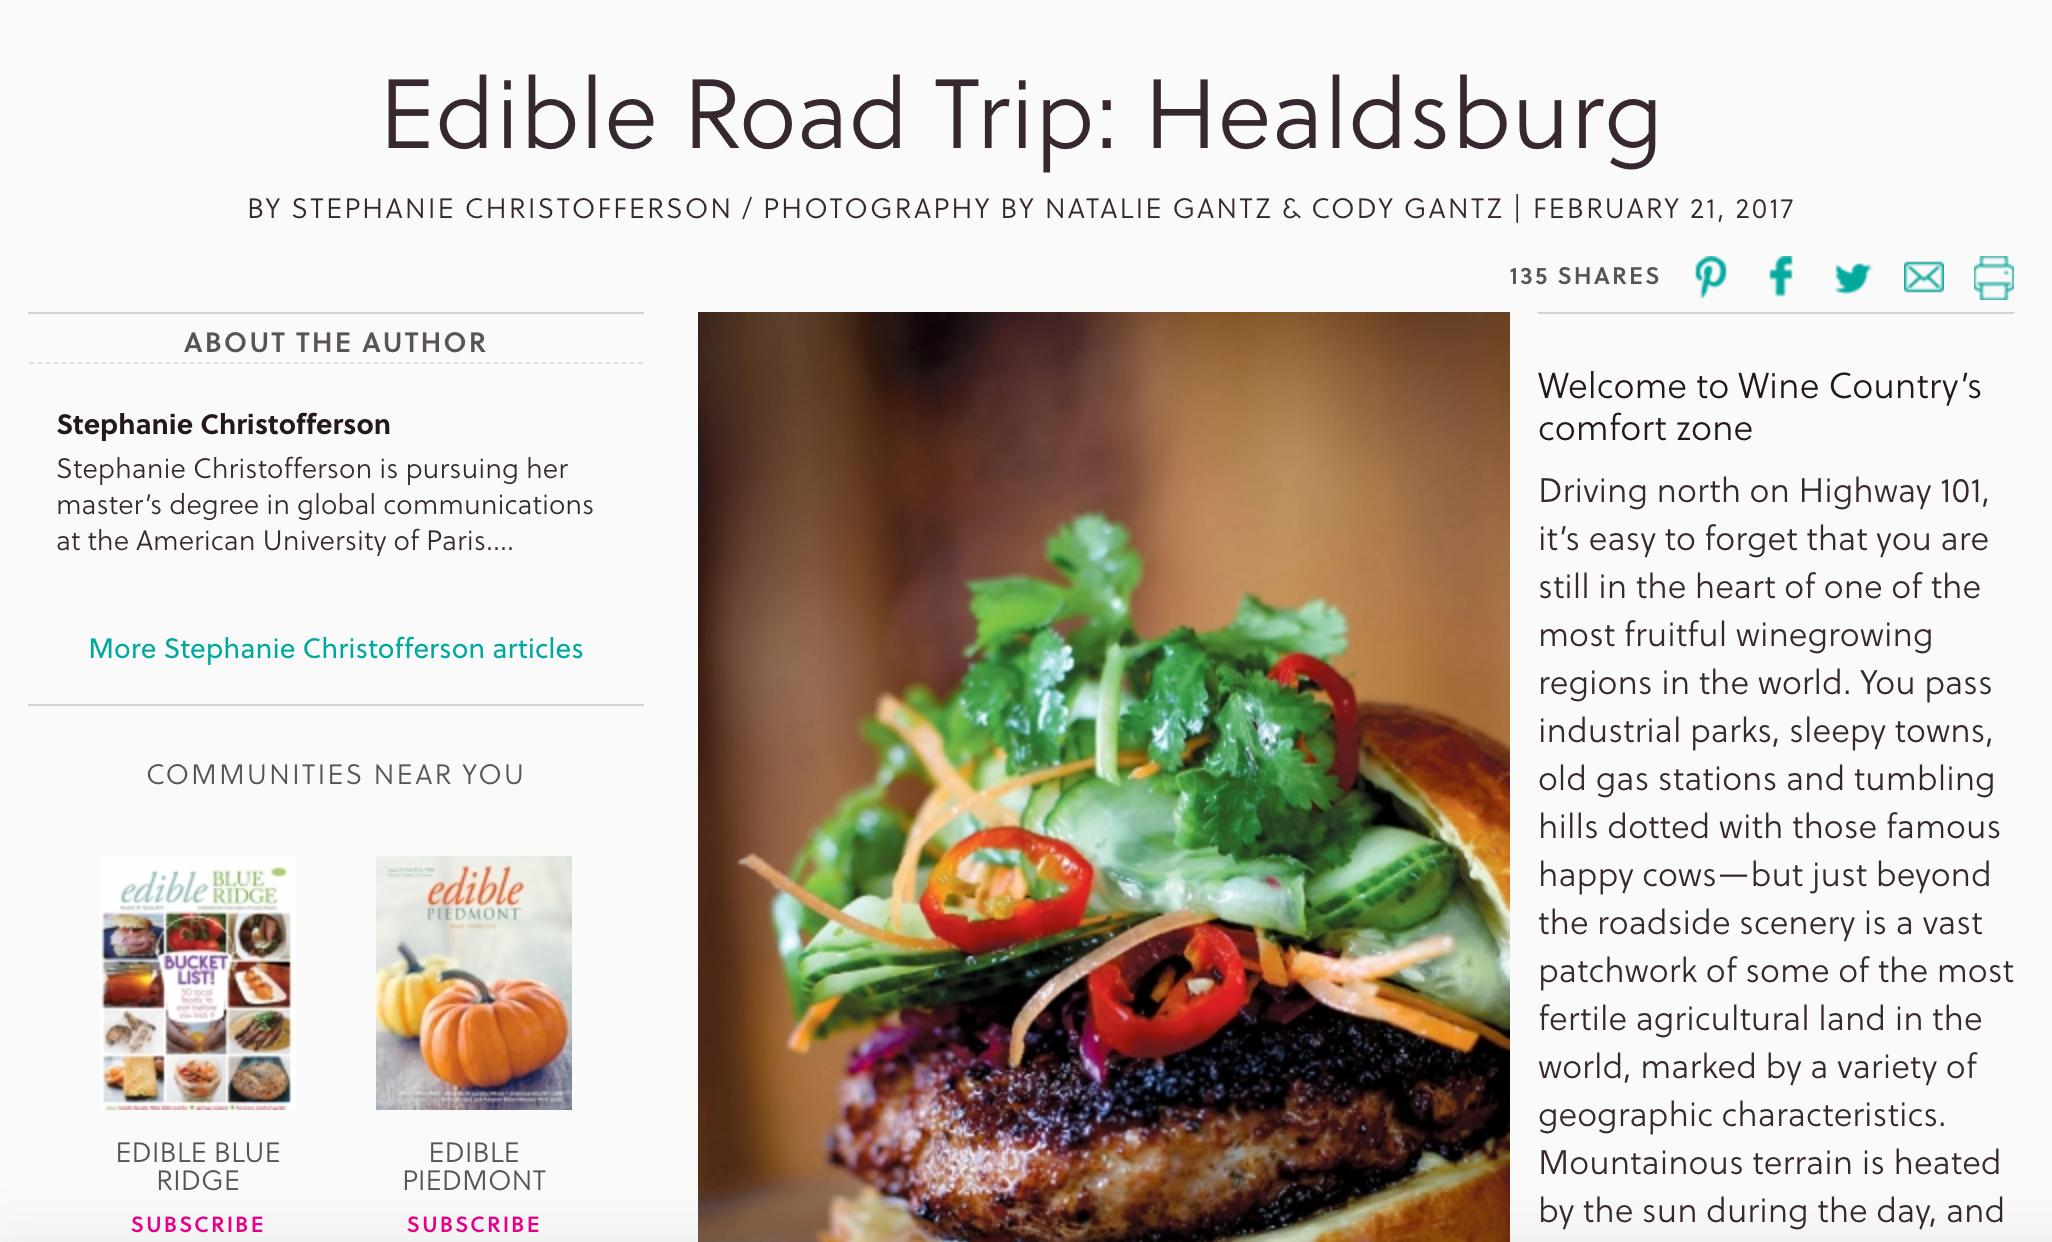 EdibleRoadTripHealdsburg